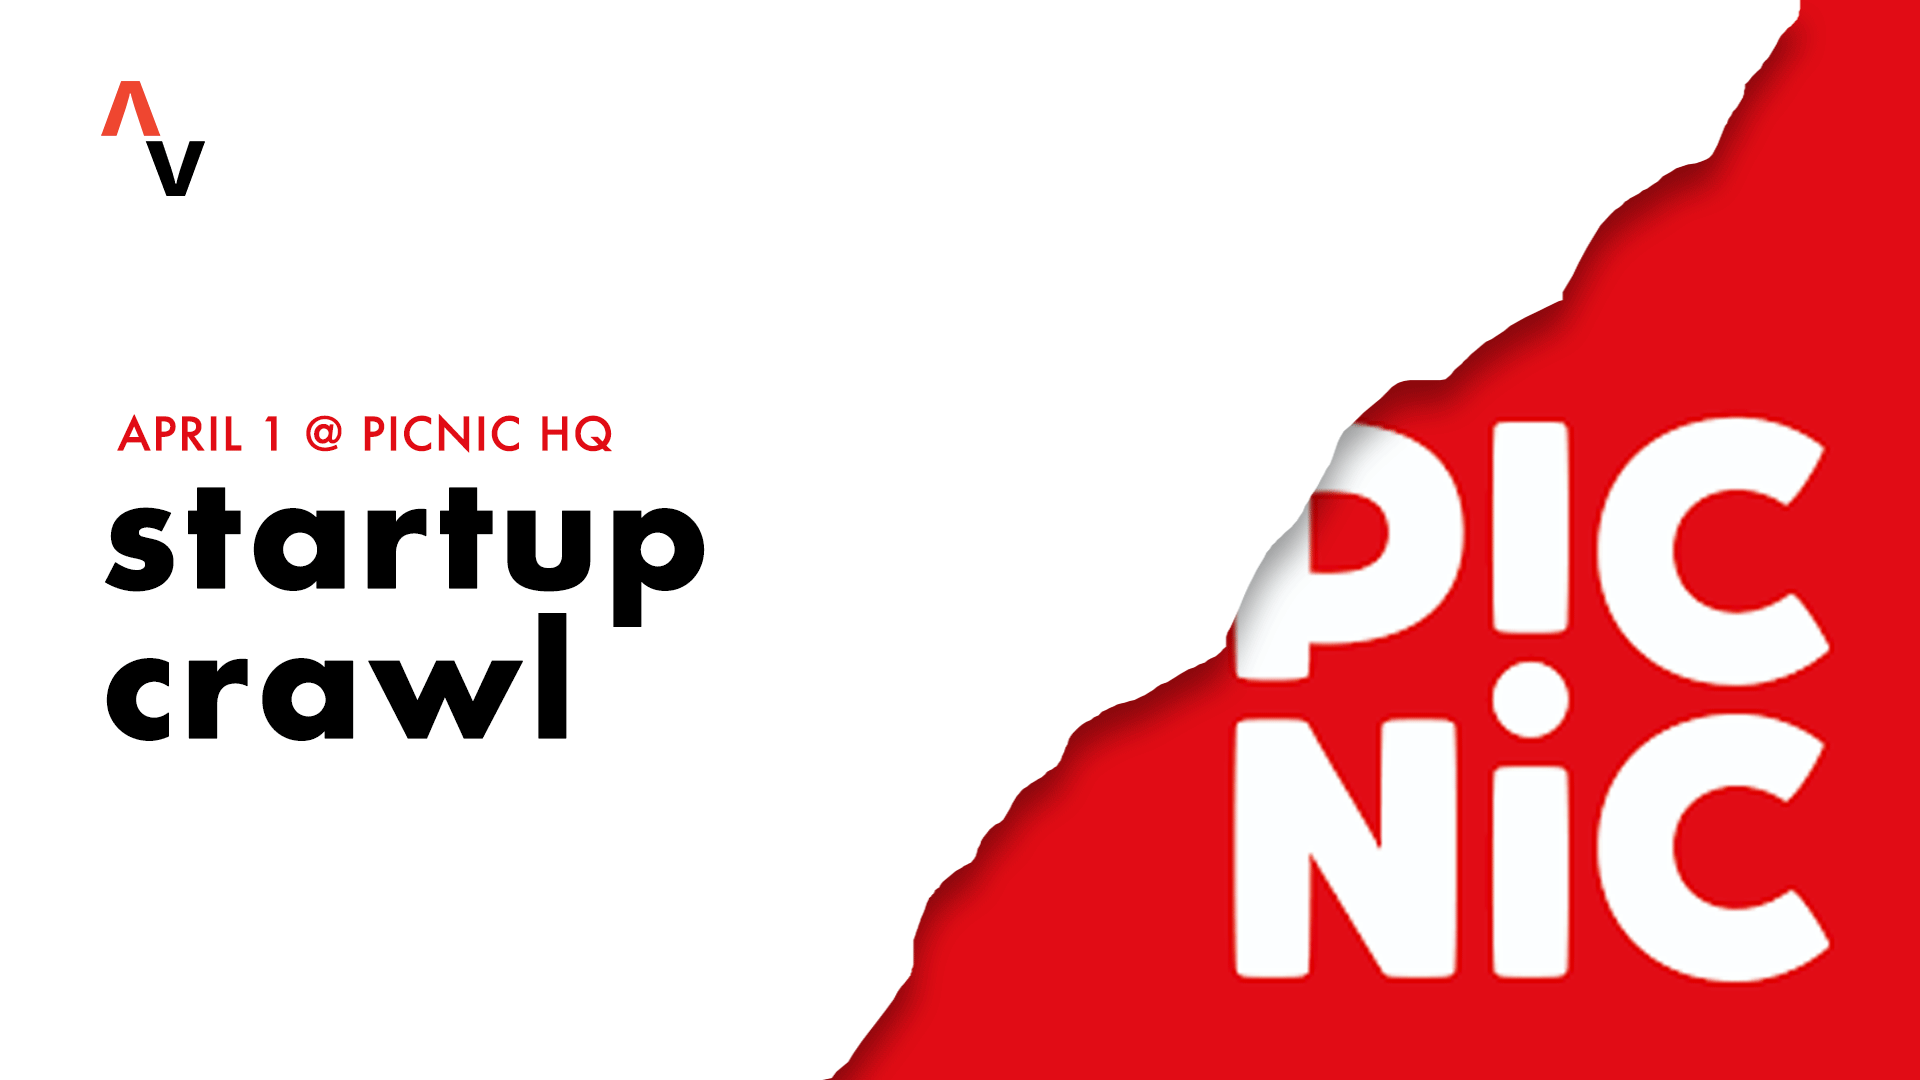 ASIF_Startup-Crawl_Picnic.png